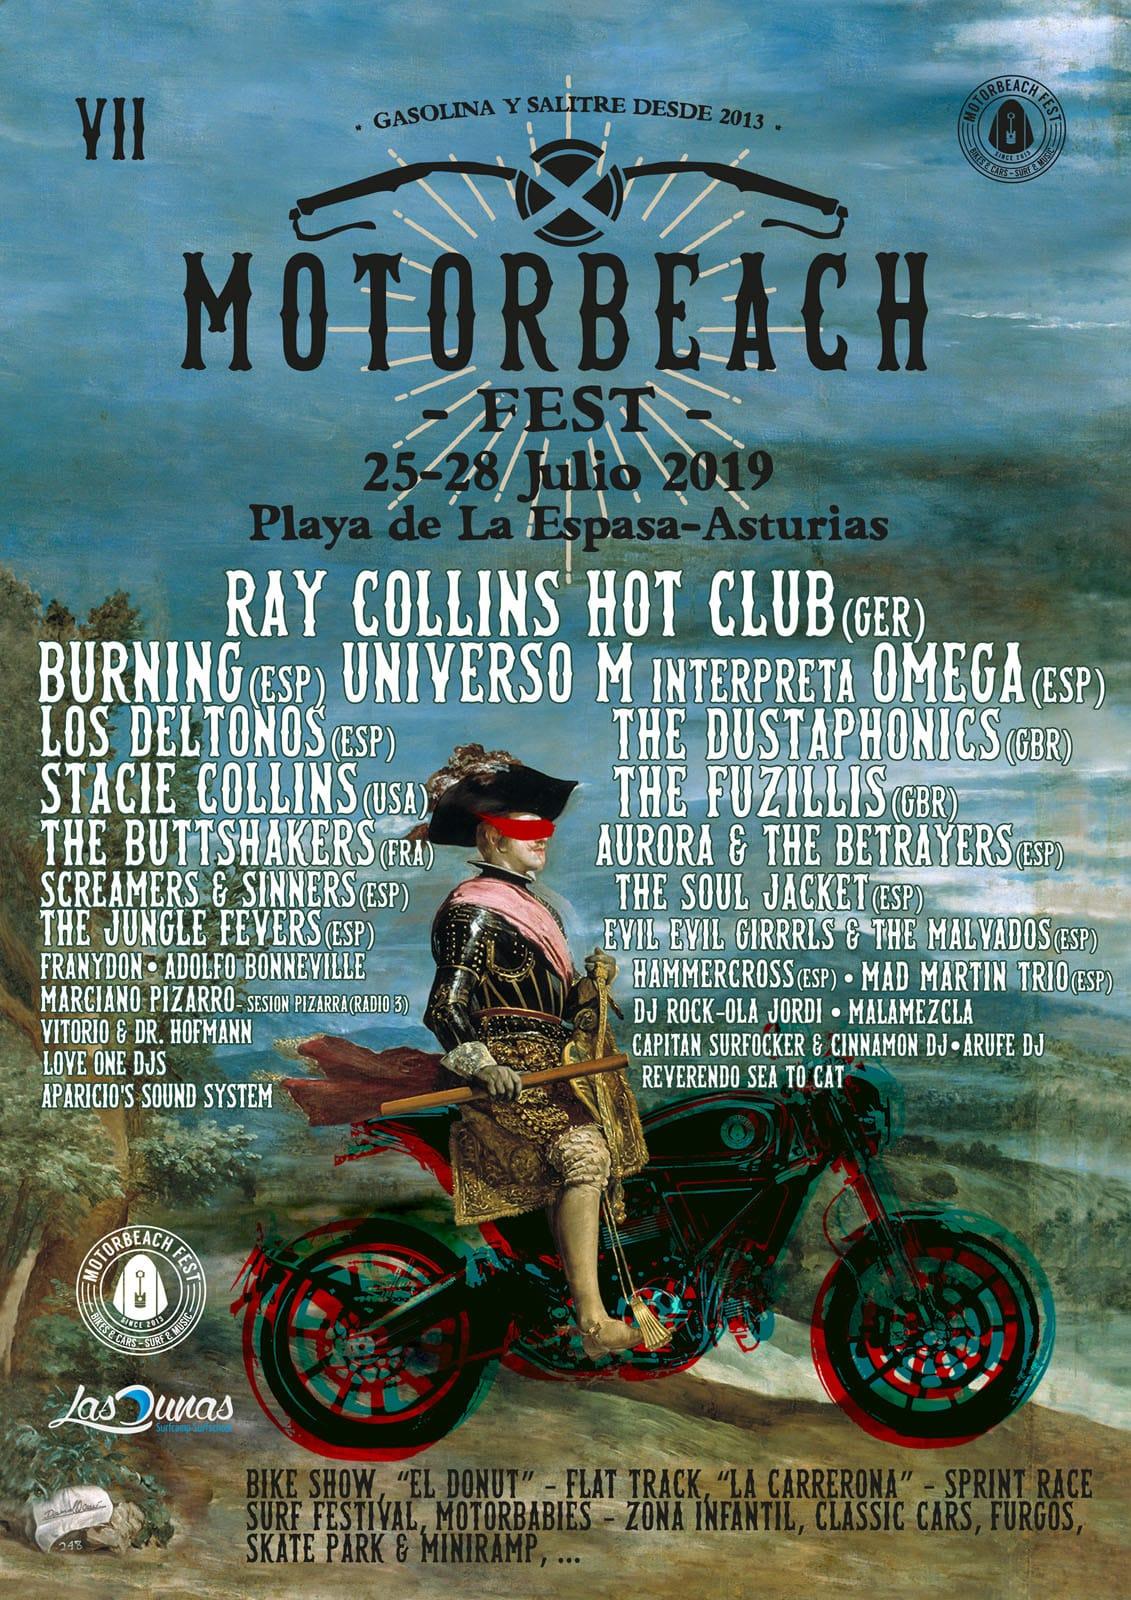 Cartel VII Motorbeach Fest